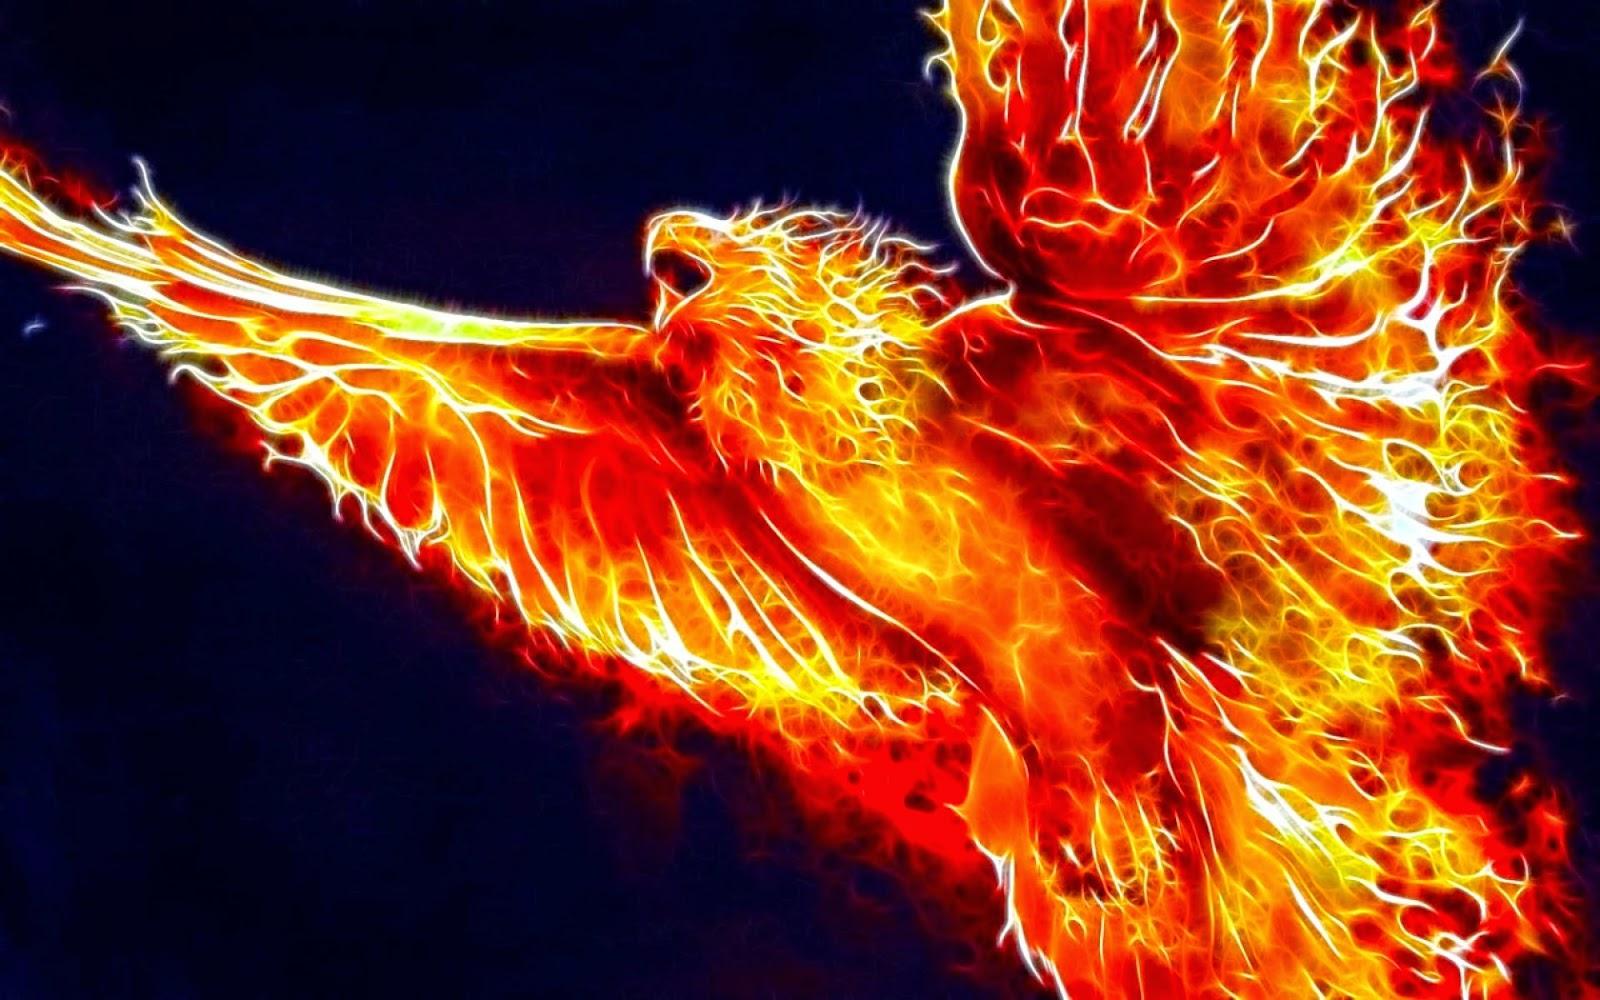 Violetas el mito del ave fenix - Fenix bird hd images ...